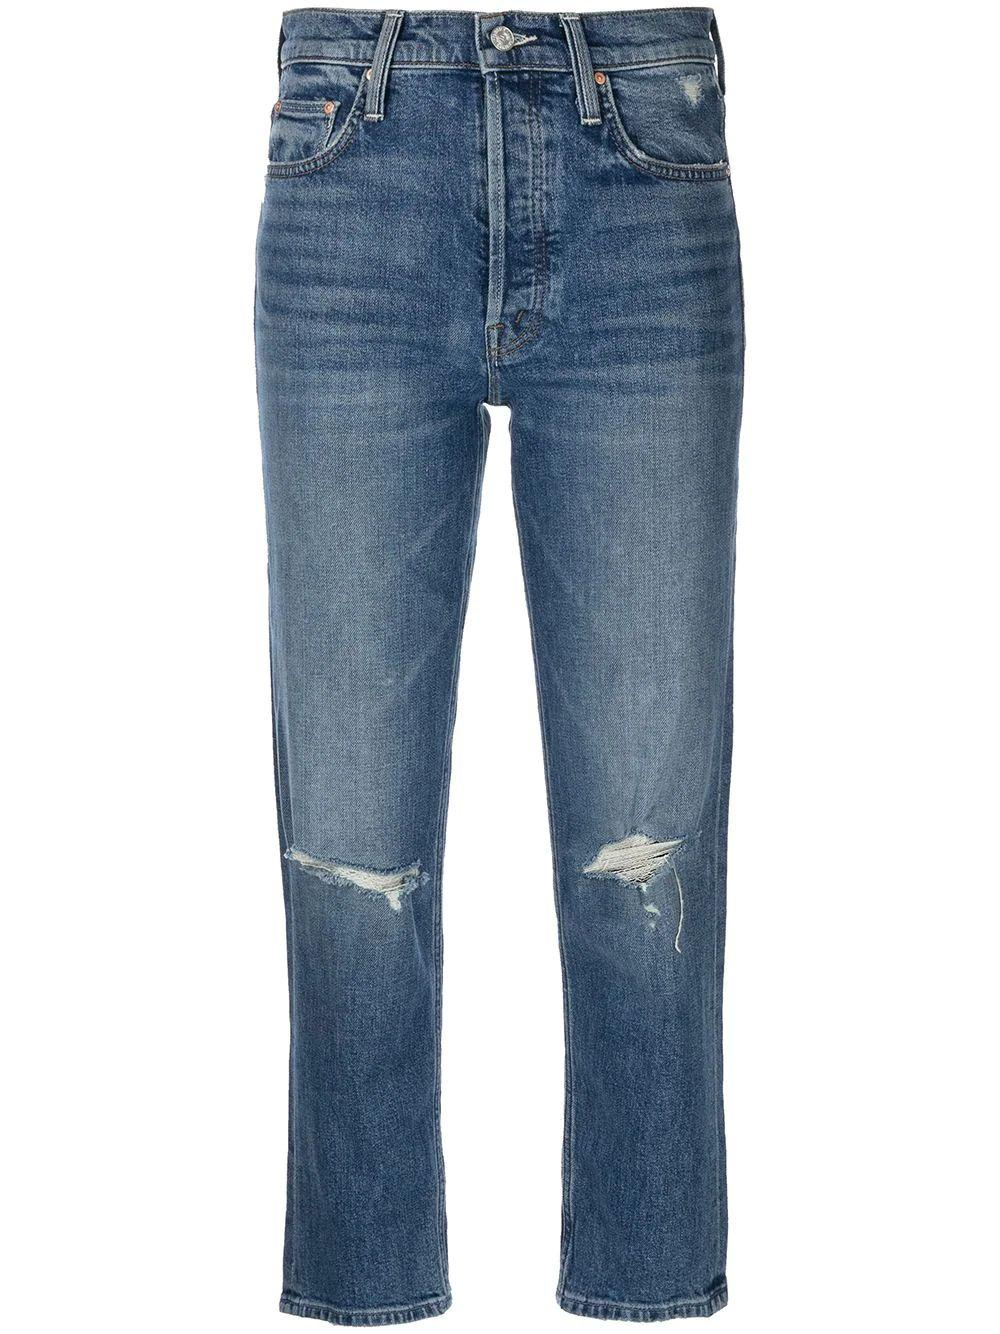 The Tomcat Straight Leg Item # 1364-259-PWS